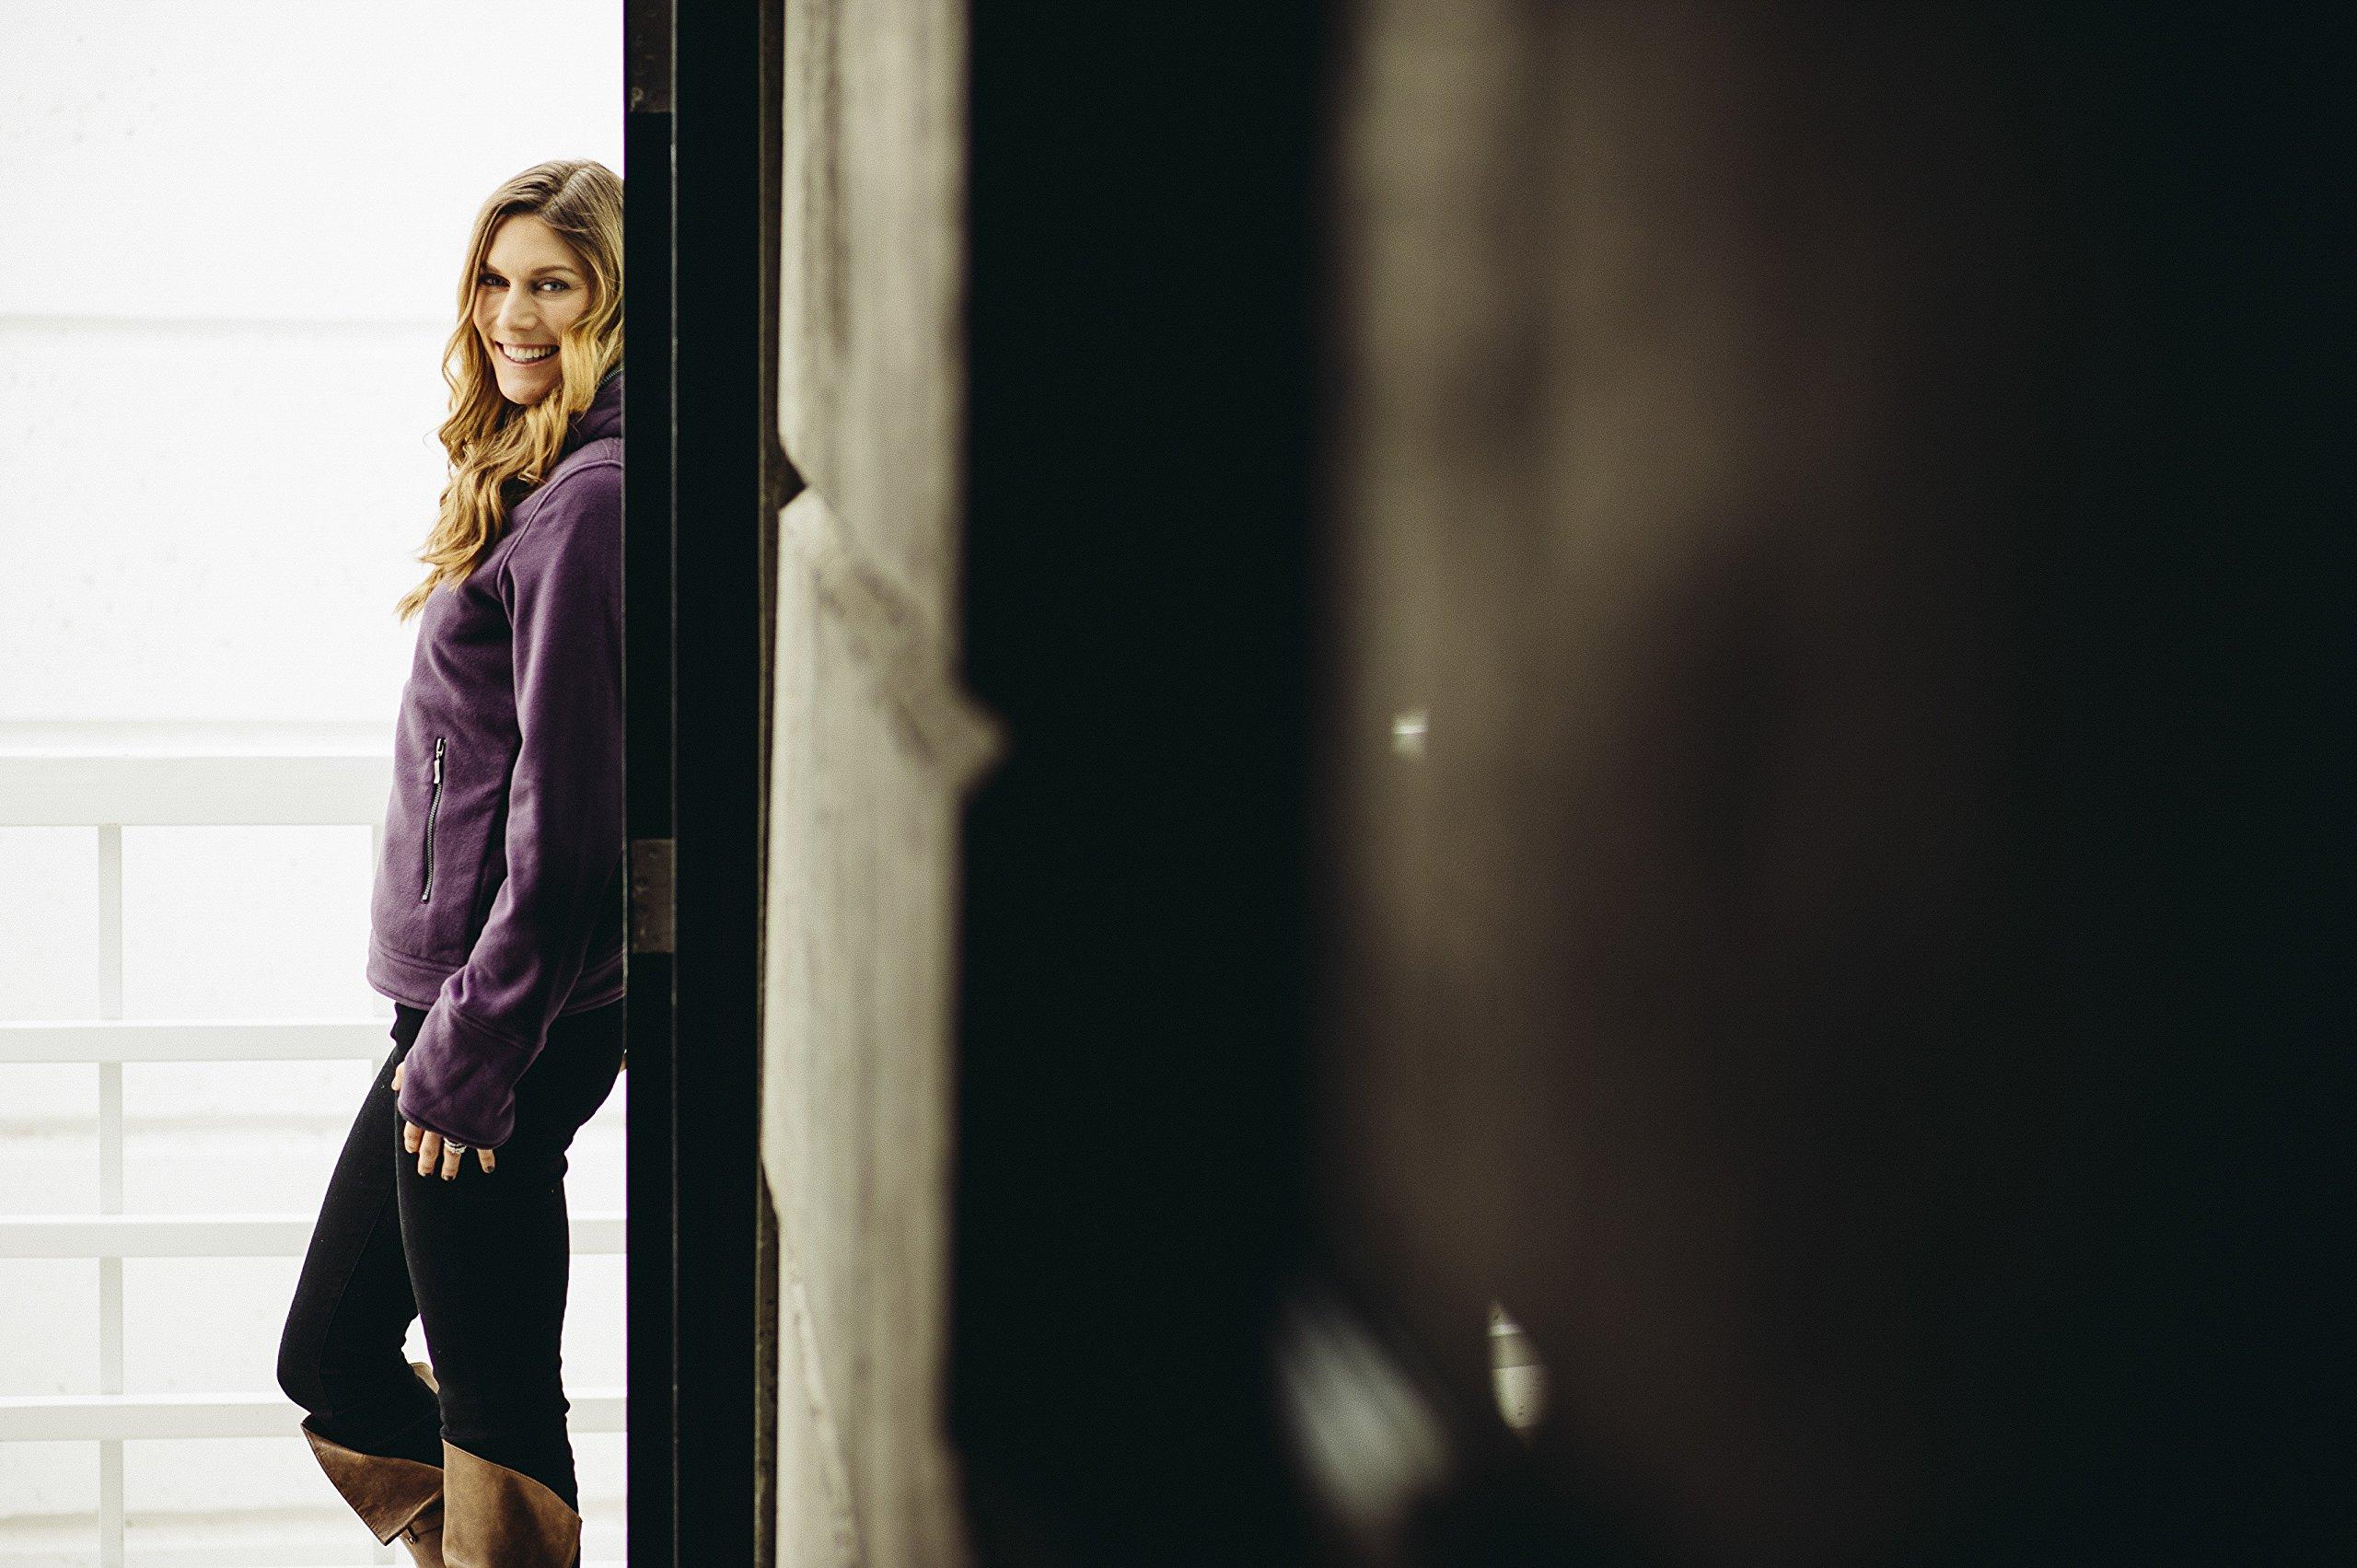 SCOTTeVEST Chloe Hoodie - 14 Pockets - Travel Clothing, Pickpocket Proof DAR S by SCOTTeVEST (Image #4)